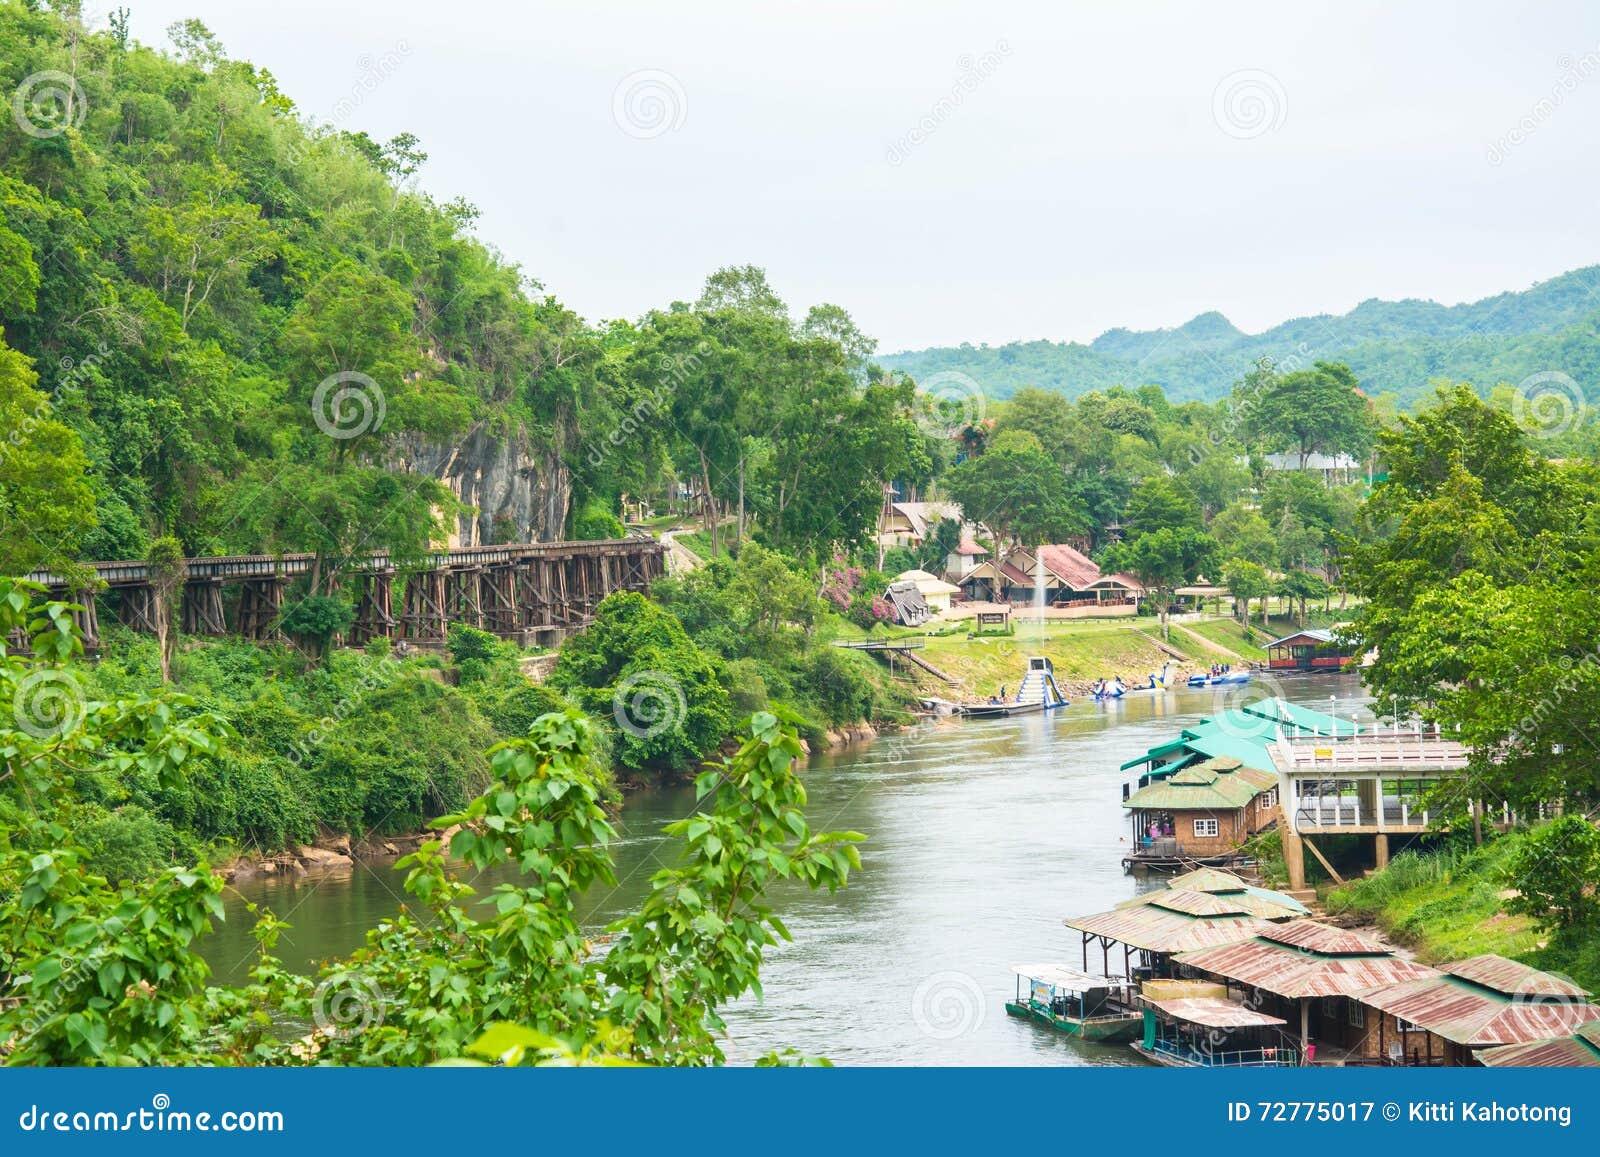 Passenger trains Tham Kasae bridge Death Railway on the River Kwai Kanchanaburi, Thailand